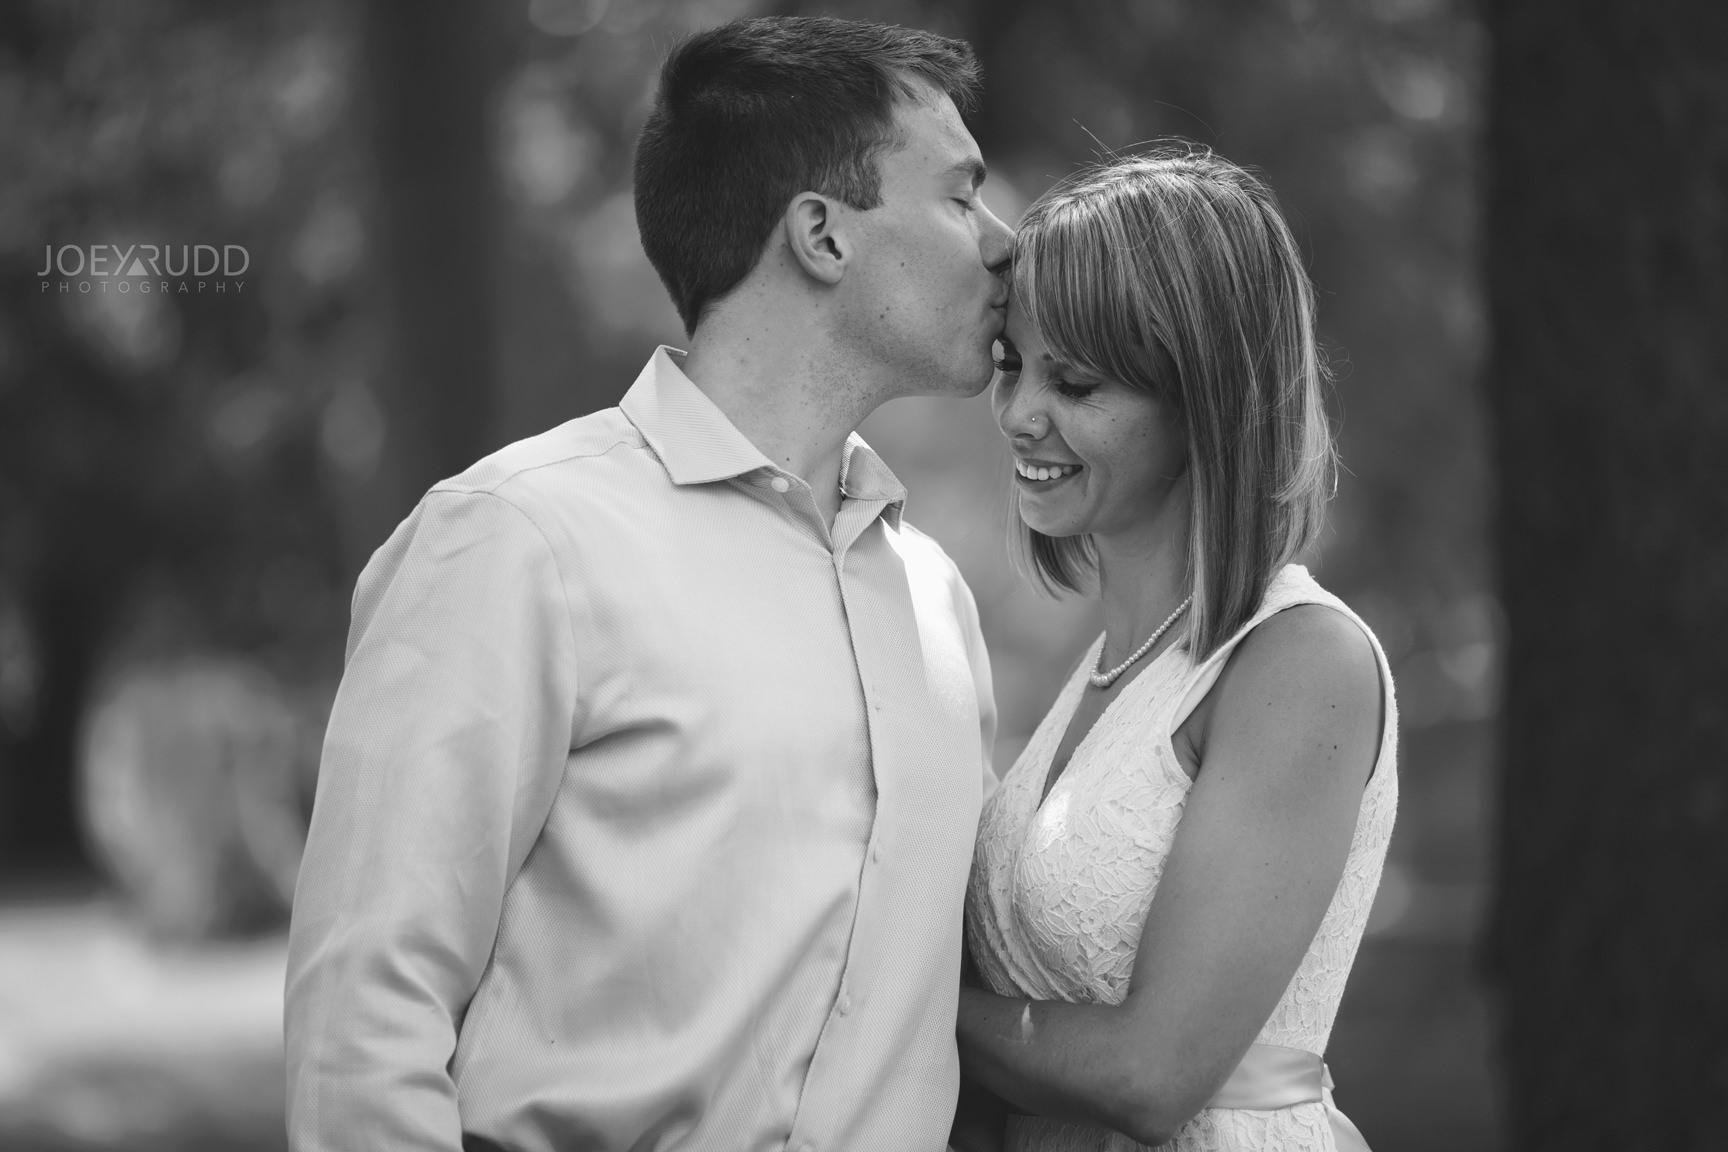 Elopement Wedding Ottawa Photographer Elope Photography Joey Rudd Photographer Romantic